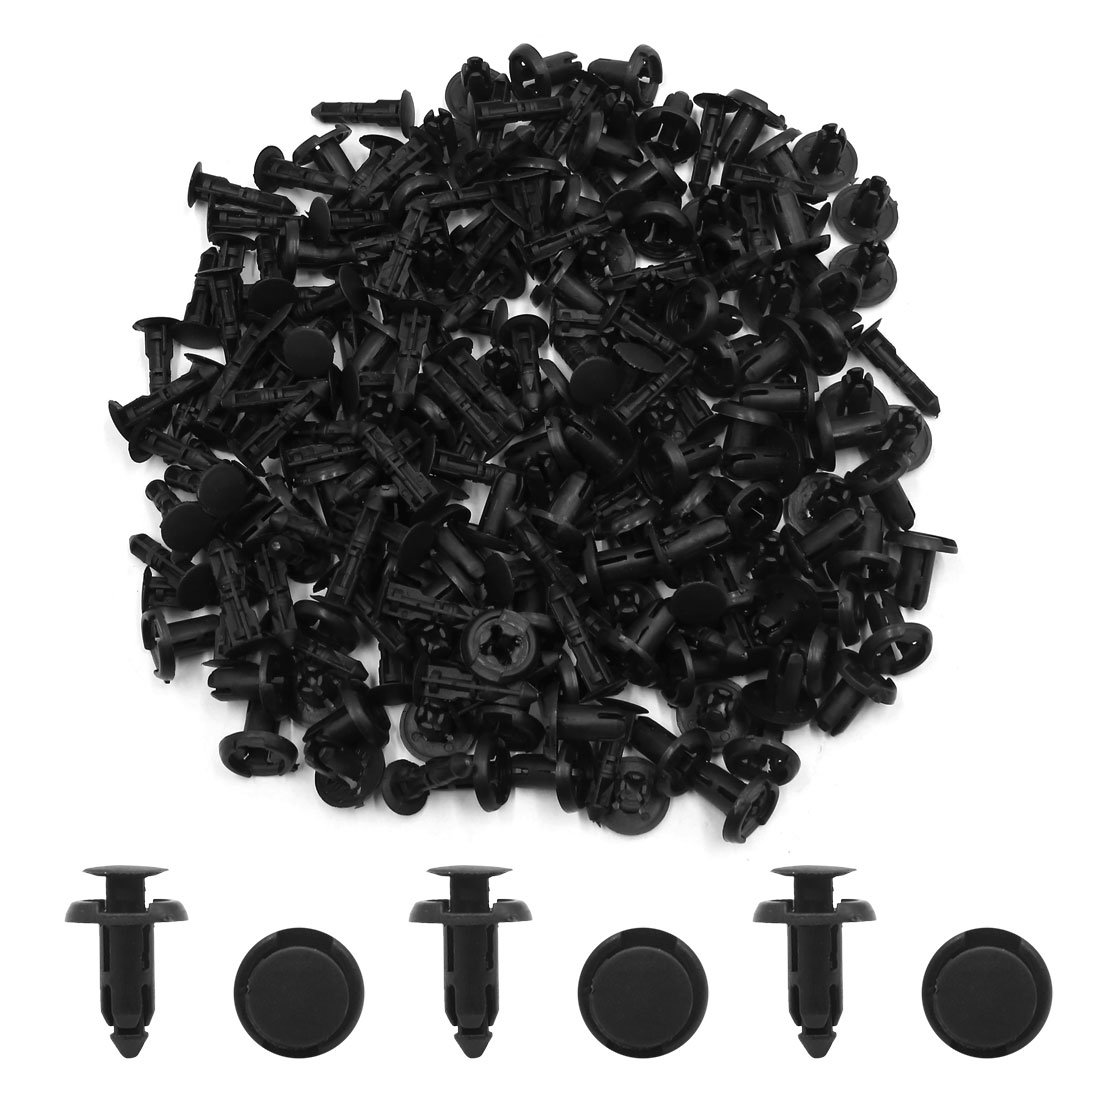 sourcing map 100Pcs Rivet Fixation Noir Pare-Chocs Voiture Corolla Rav4 Prado